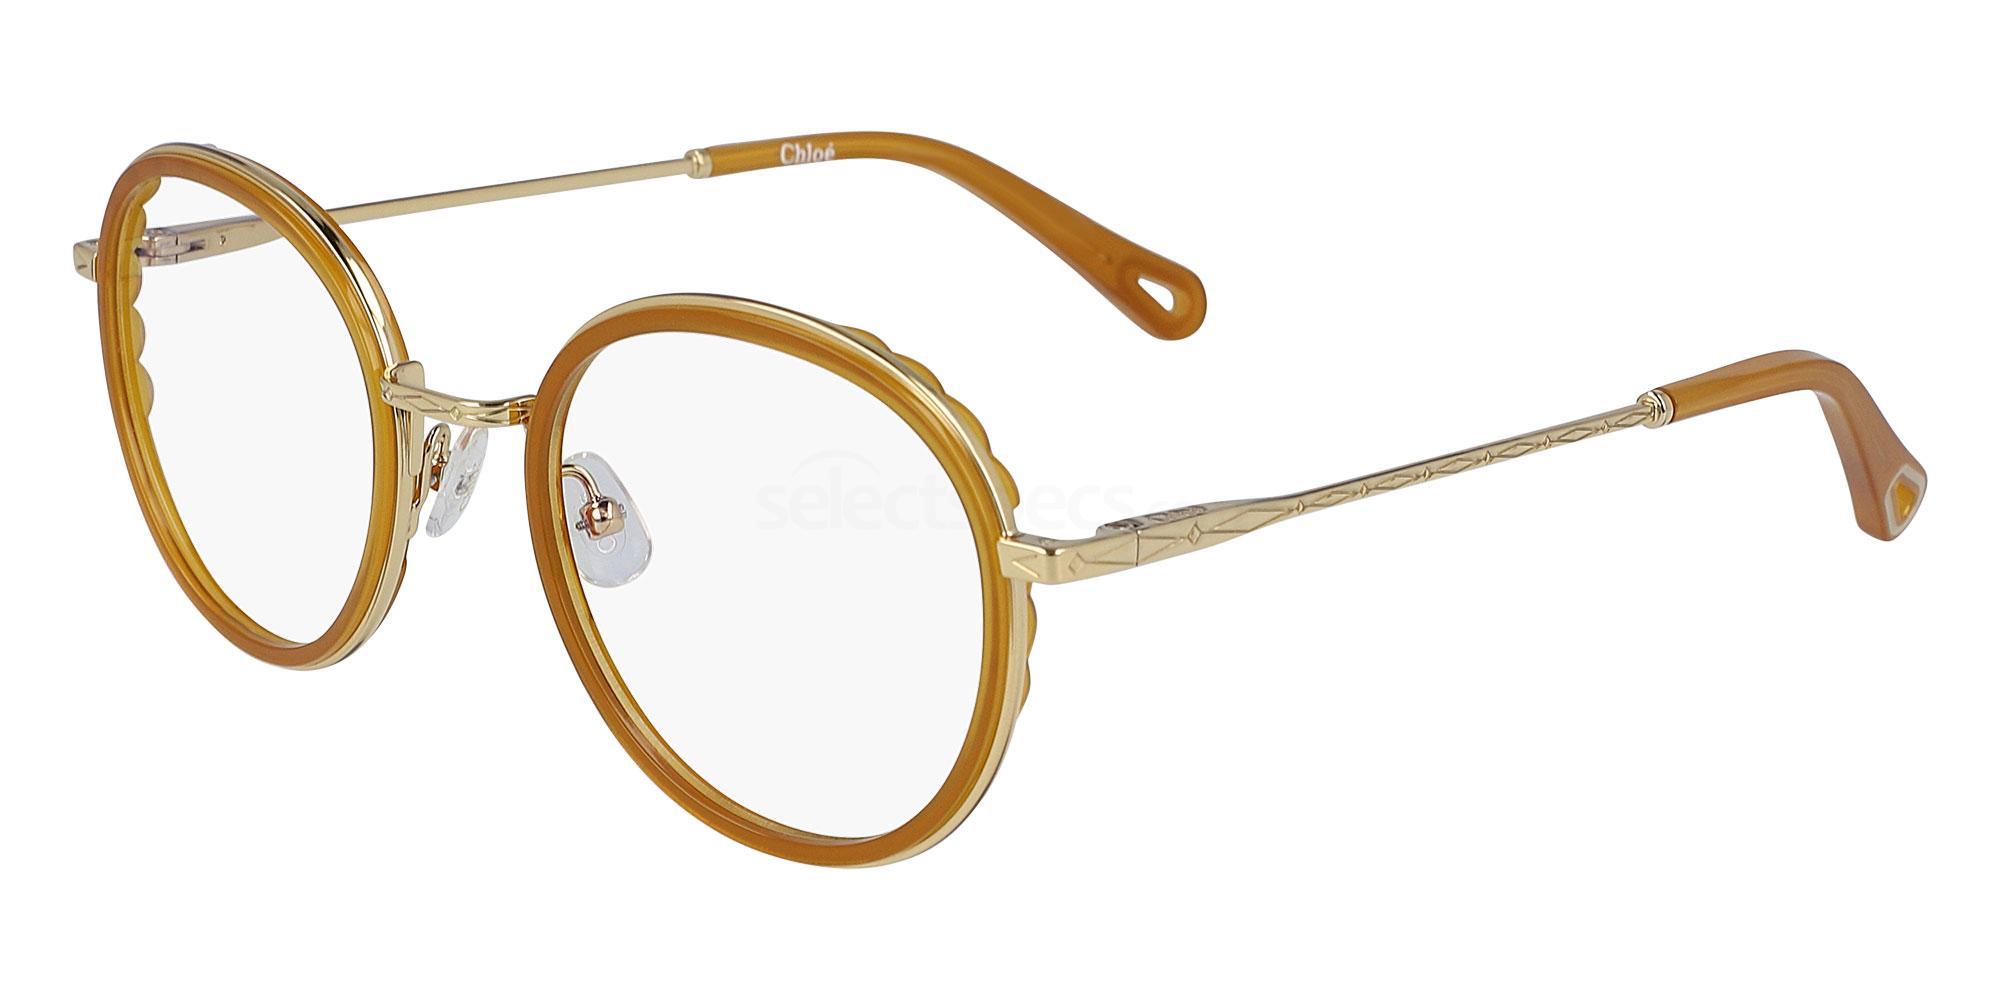 829 CE2150 Glasses, Chloe